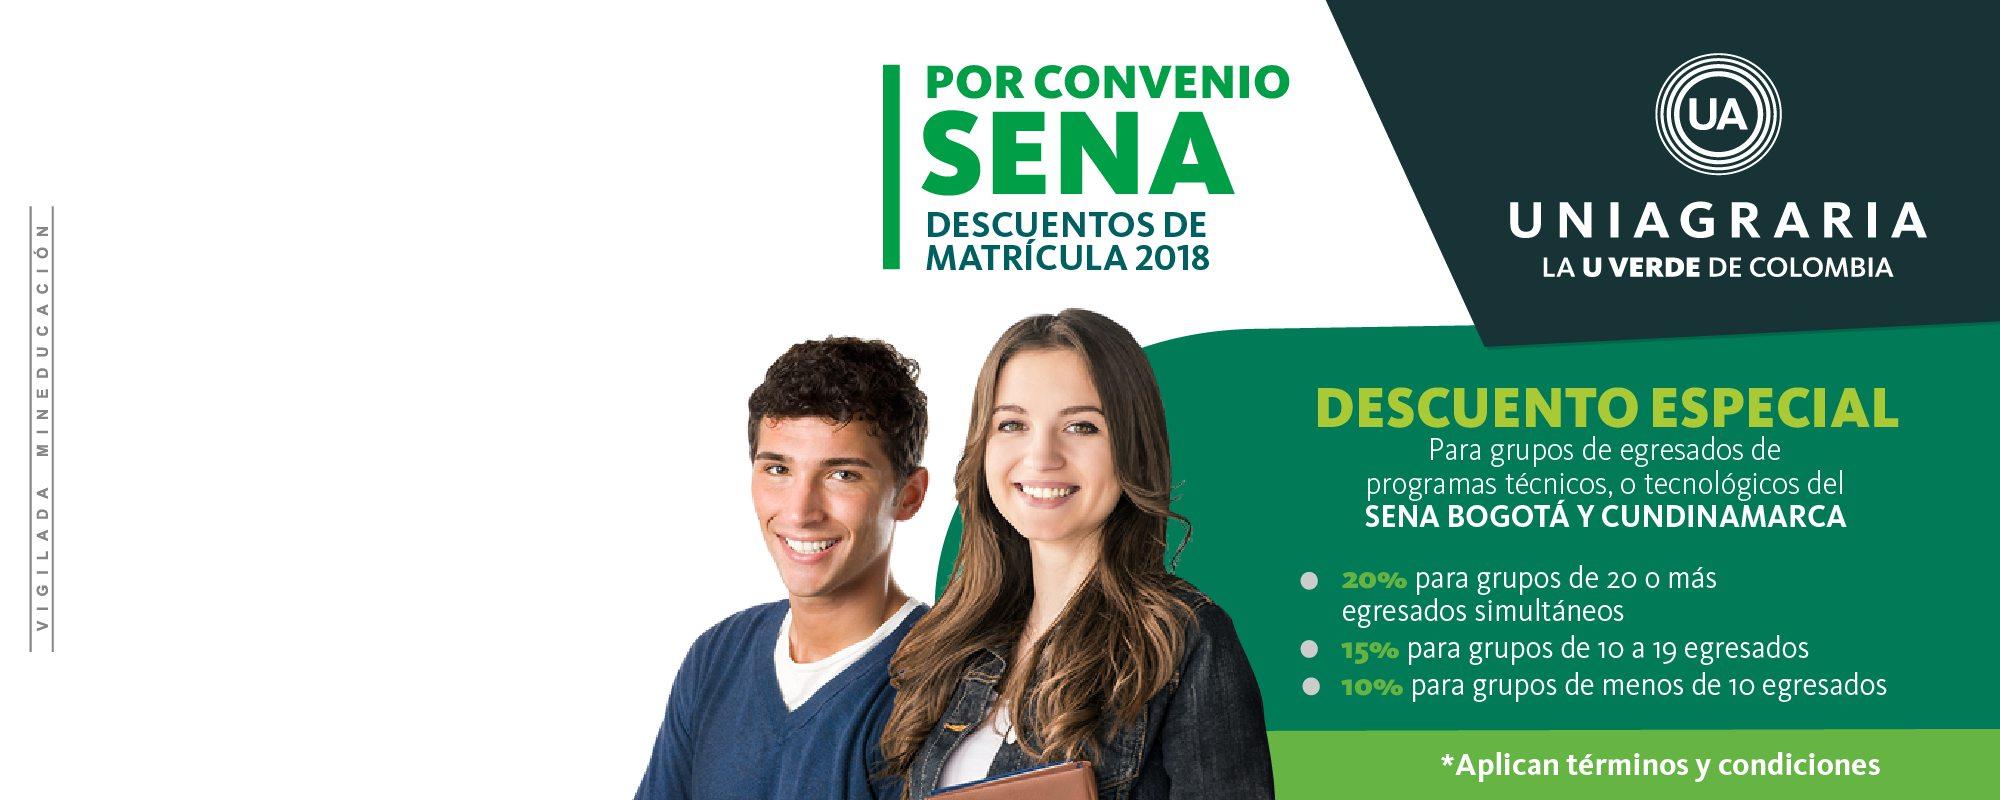 Descuentos de matrícula 2018 – Convenio SENA